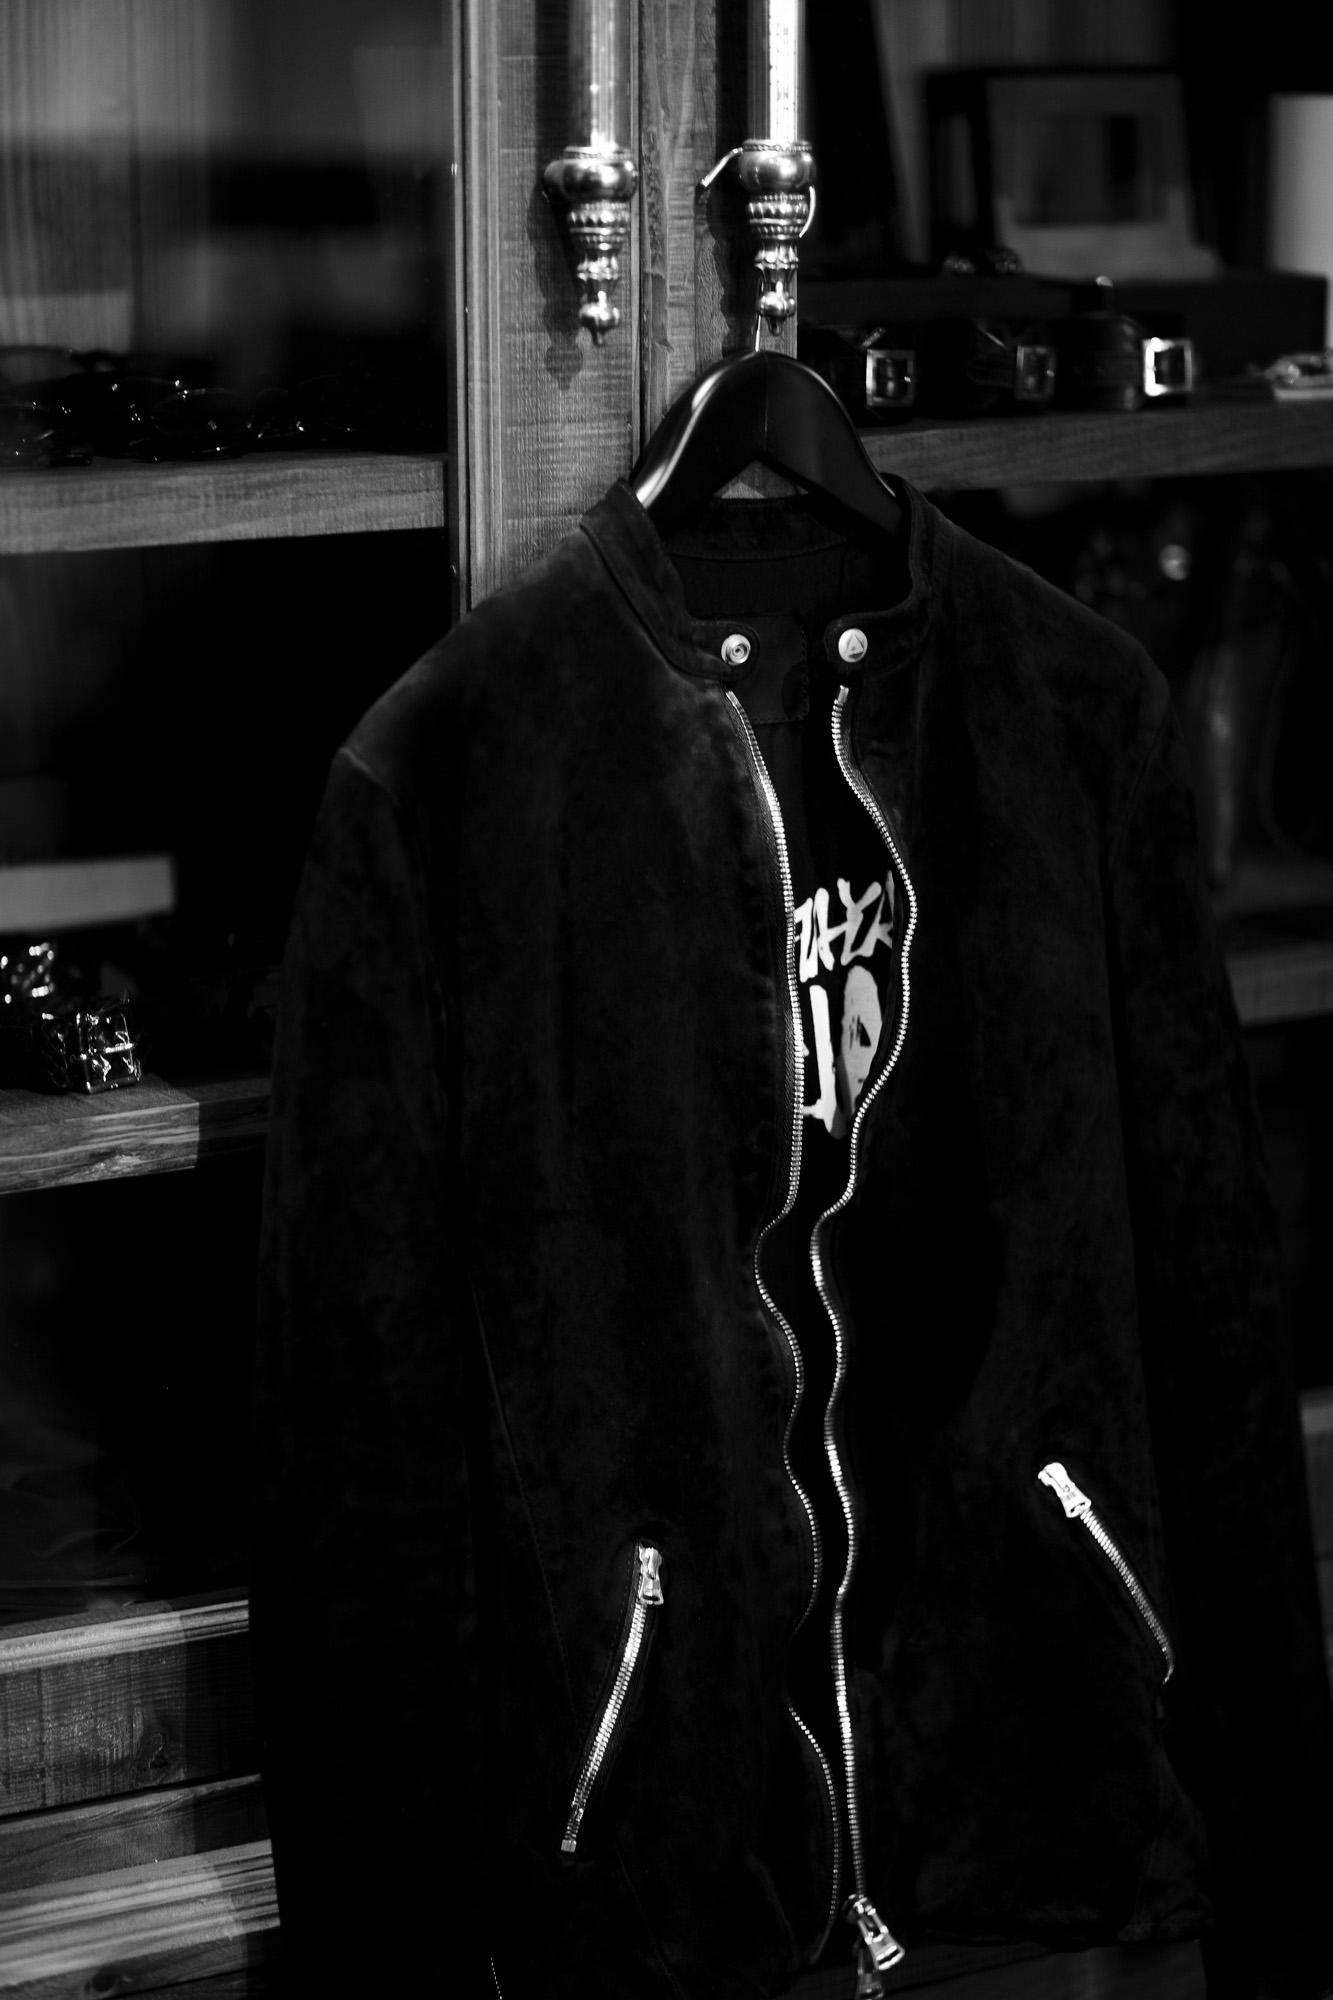 "ISAMU KATAYAMA BACKLASH JAPAN CALF WET WHITE ""GARMENT-DYED"" SINGLE RIDERS BLACK 2021AW 【Alto e Diritto 別注】【Special Model】 愛知 名古屋 Alto e Diritto altoediritto アルトエデリット イサムカタヤマバックラッシュ ジャパンカーフ ガーメントダイ シングルライダース ブラック 2021秋冬 レザージャケット スエードレザー"